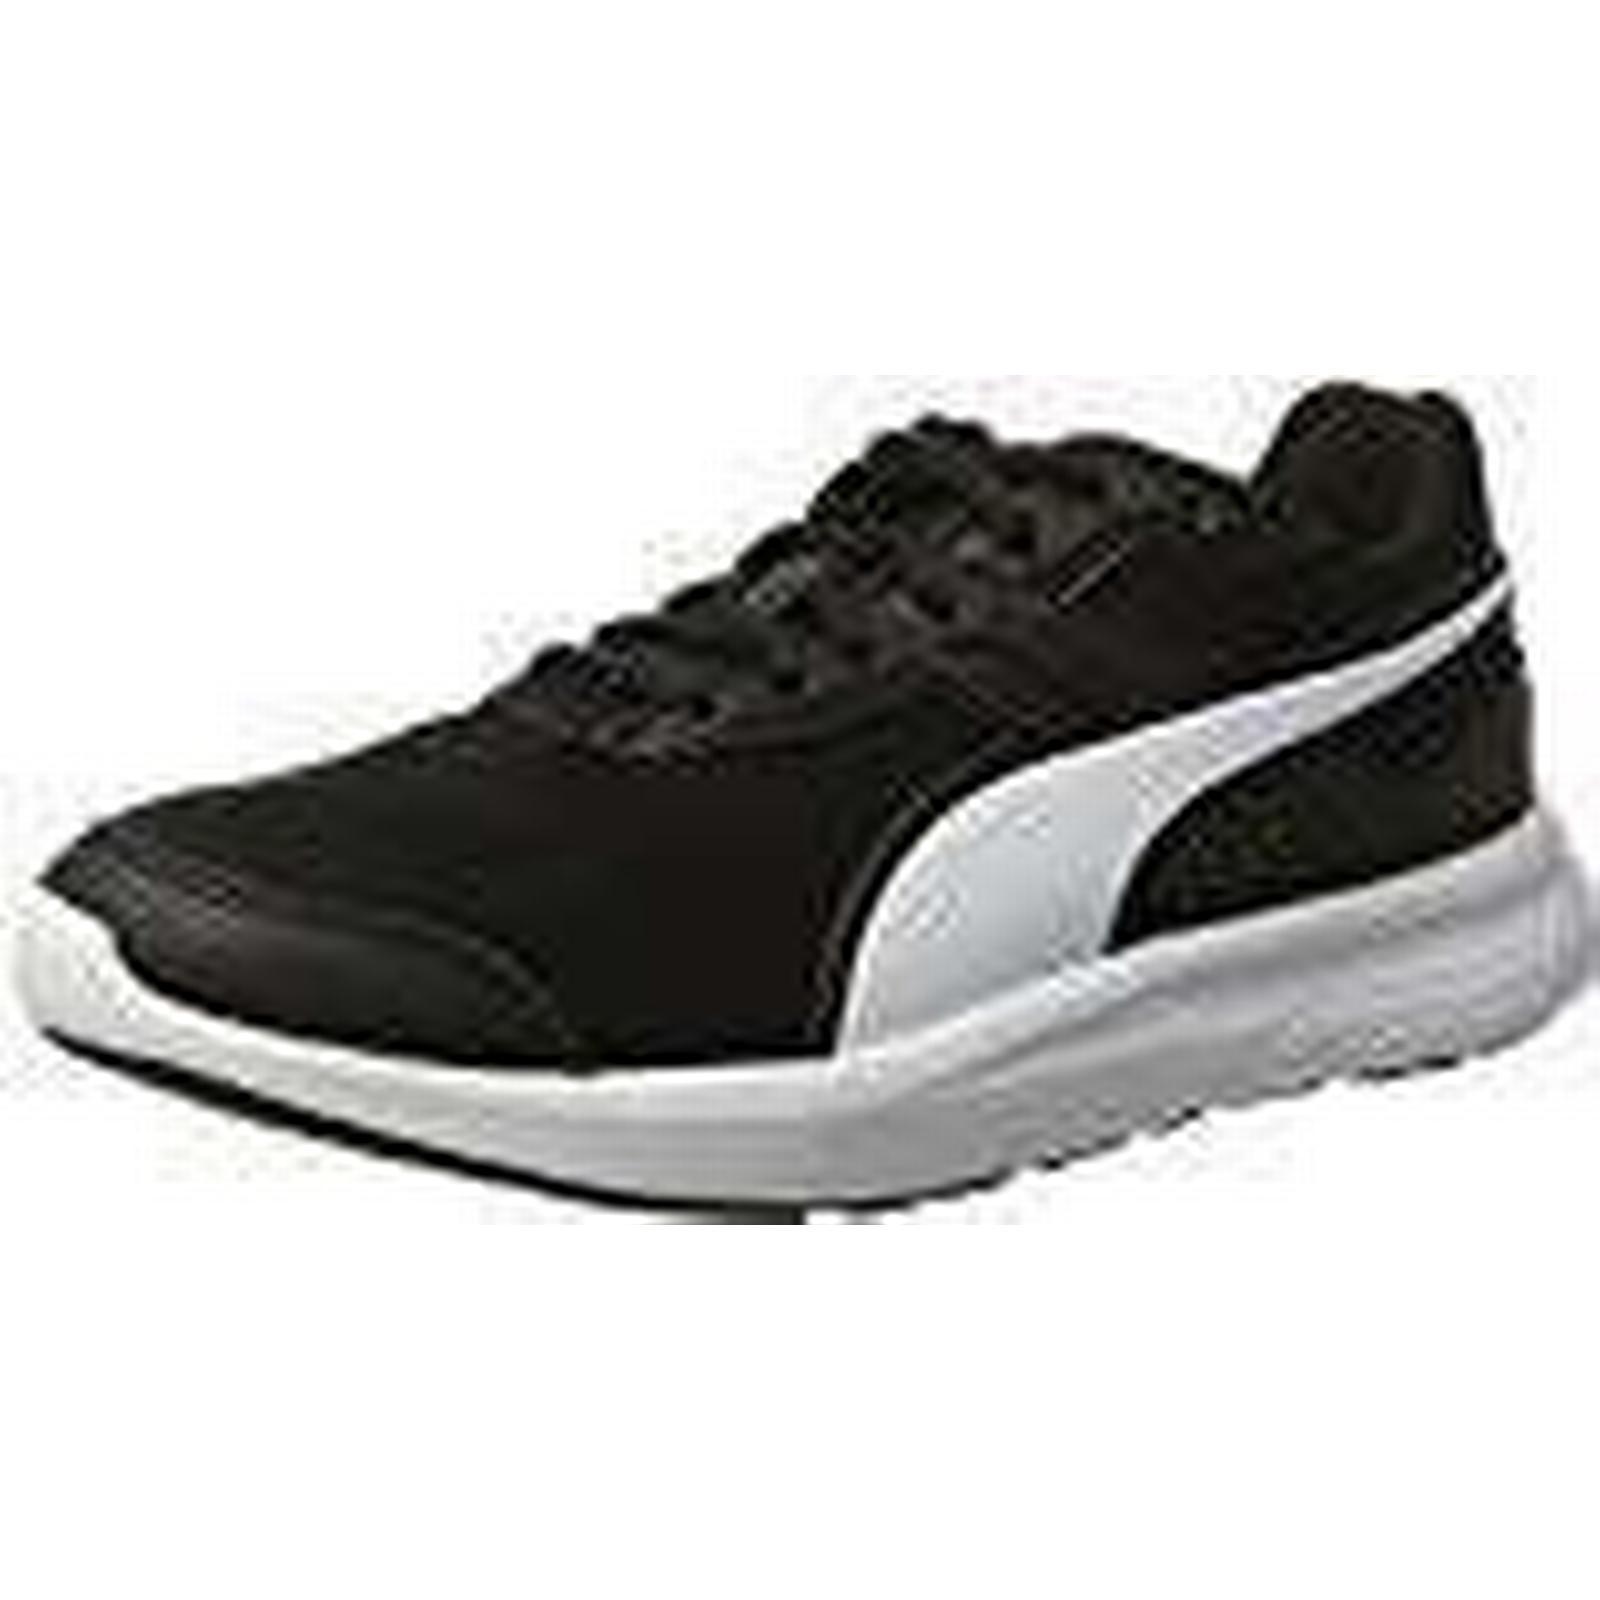 Puma Unisex Adults' Black Escaper Mesh Low-Top Sneakers, Black Adults' White, 3.5 UK 3.5 UK 7a49d8